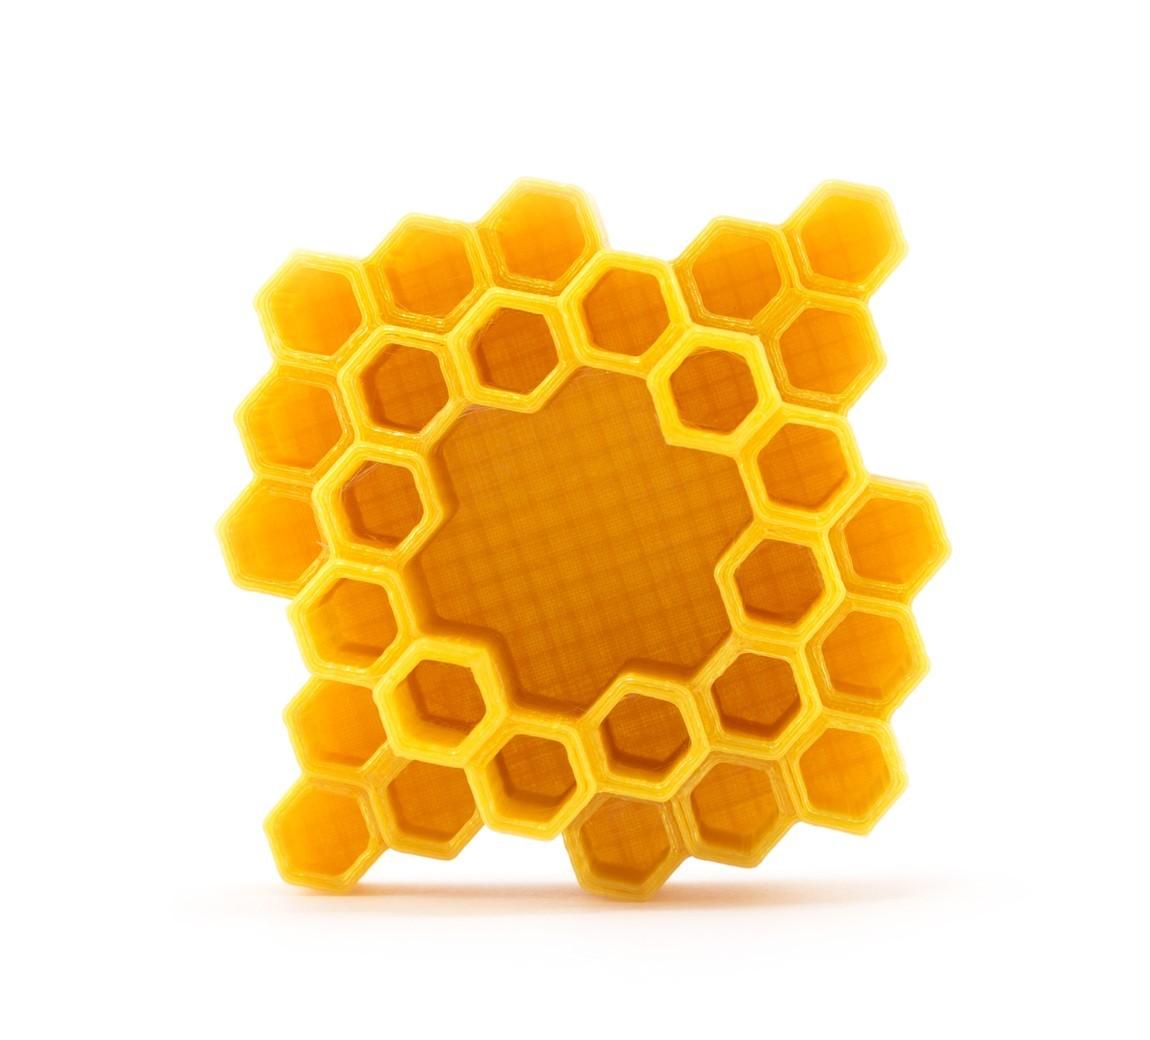 210367df949ca690fe7a9479b1862815_1452537389123_01.07.15-product-shoot-045.jpg Download free STL file Honeycomb Cup • 3D print model, Terryyy